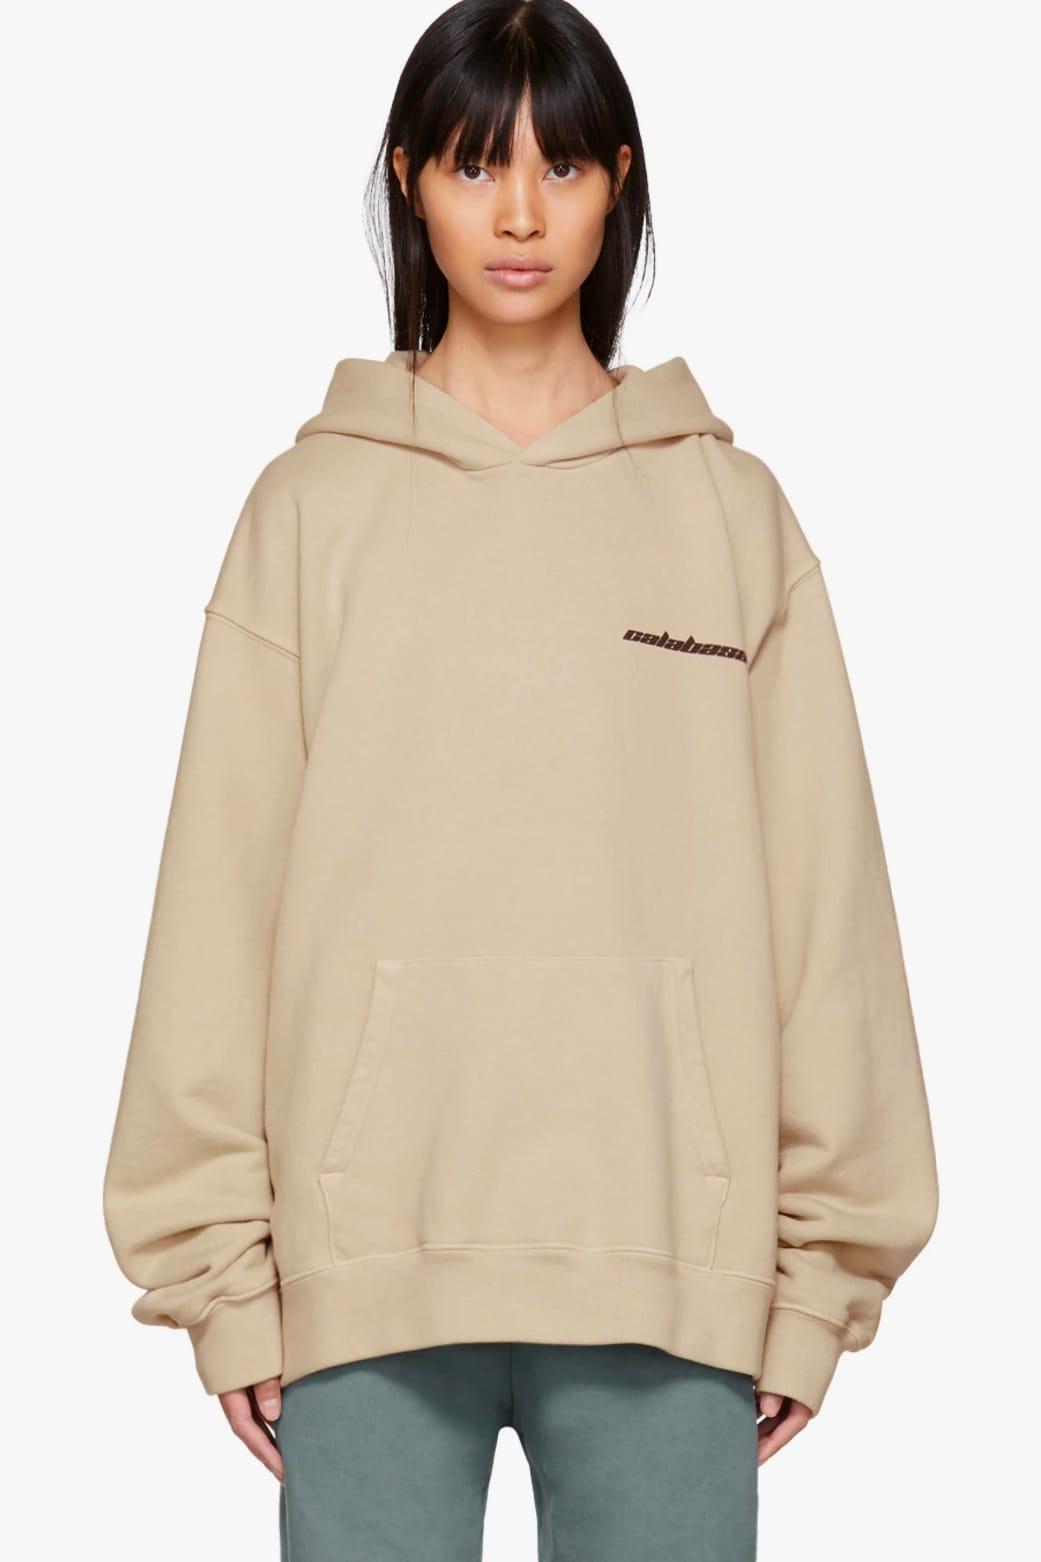 yeezy calabasas hoodie